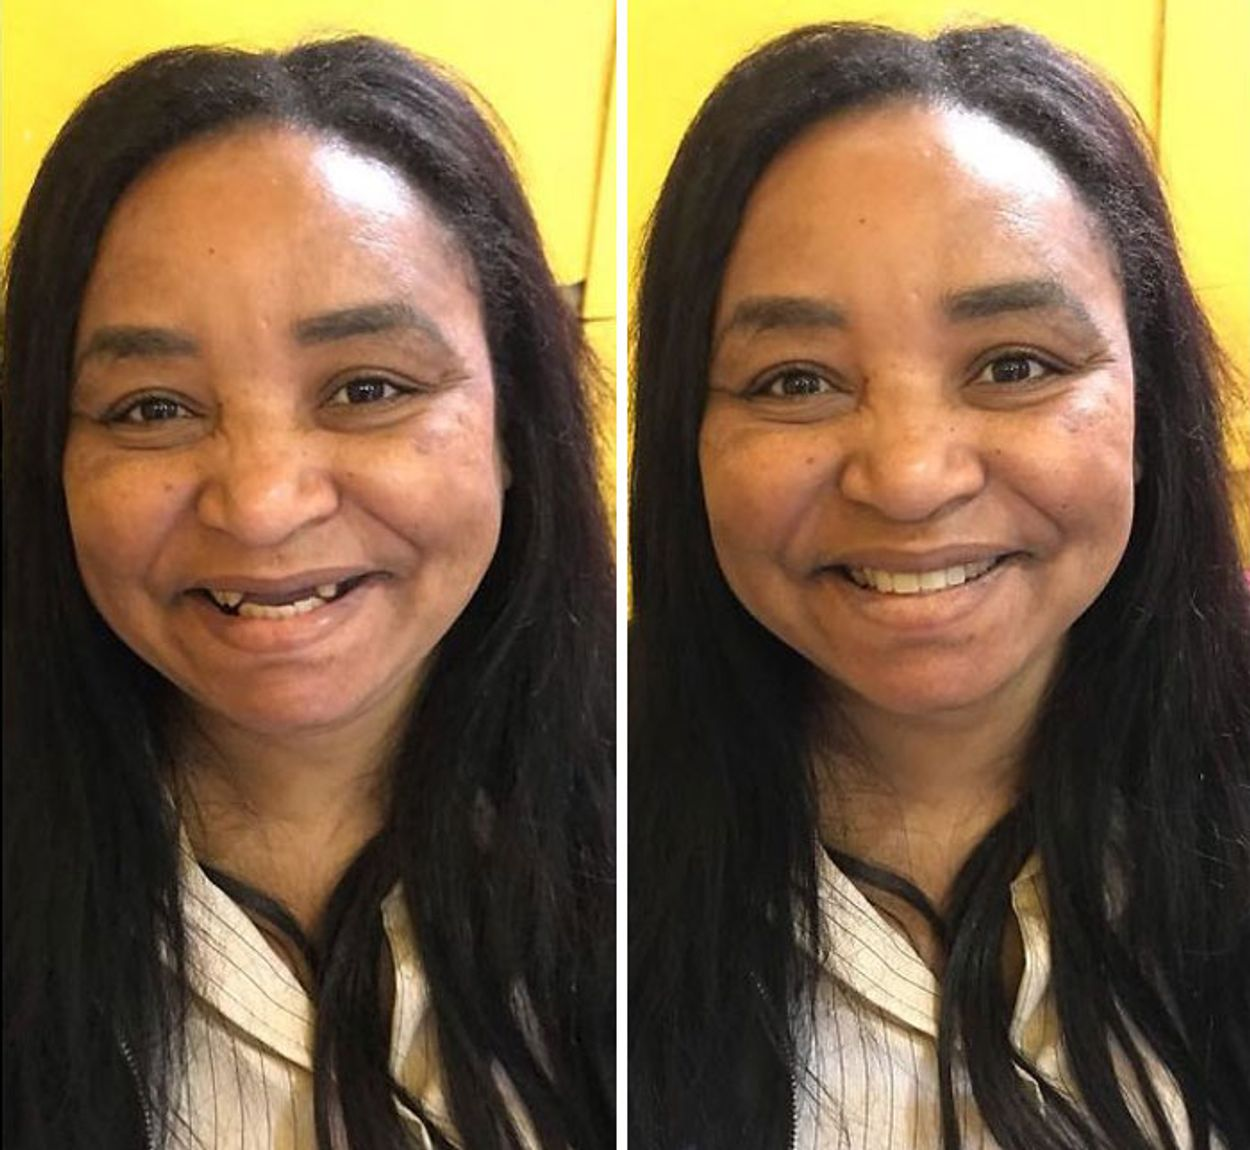 brazilian-dentist-travel-poor-people-teeth-fix-felipe-rossi-40-5db95391ac521__700